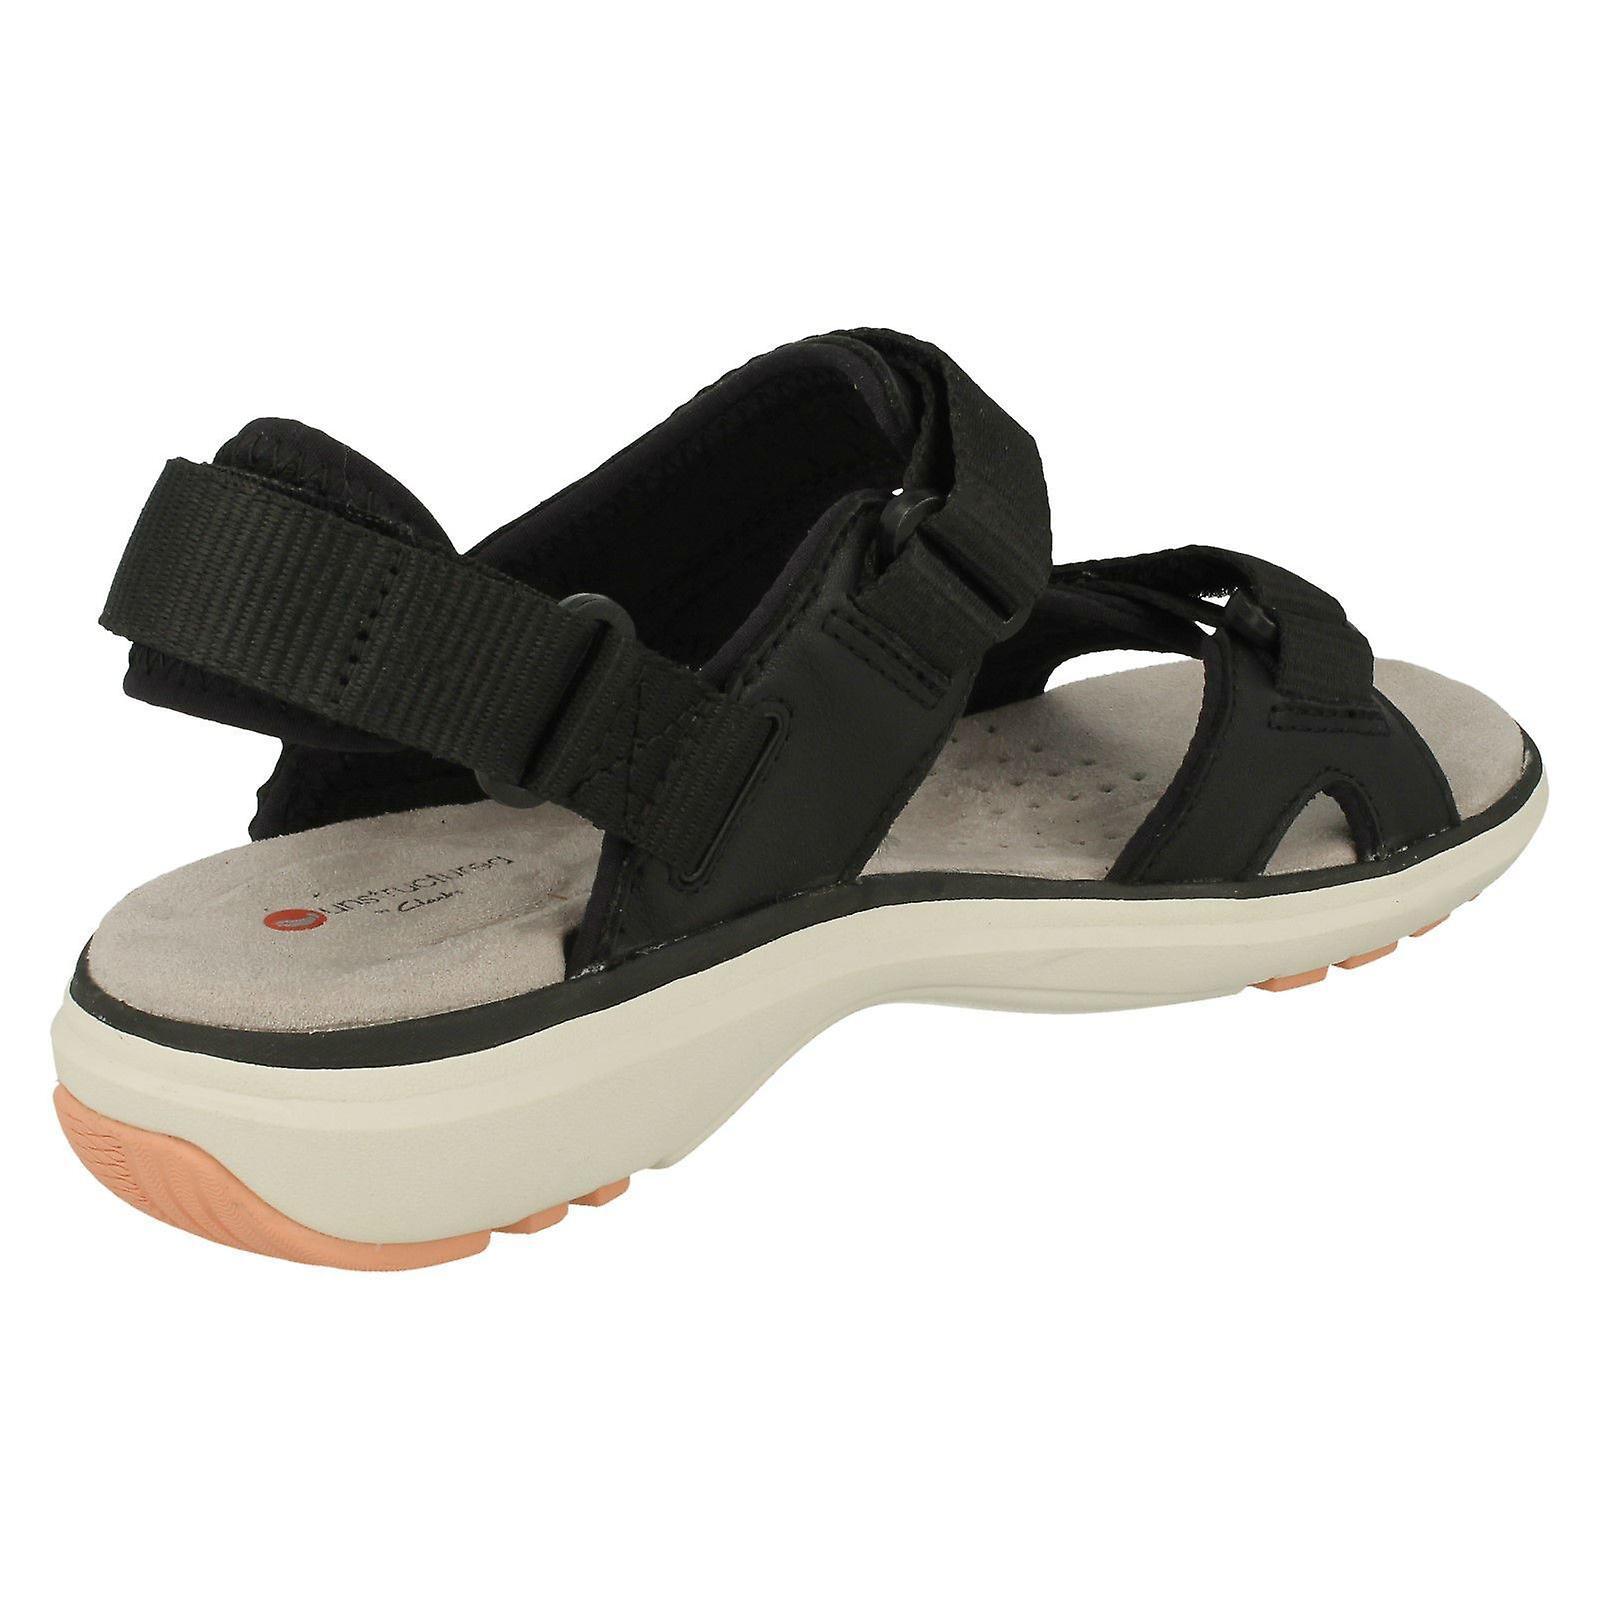 /'Un Roam Step/' Ladies Clarks Leather Hook and Loop Fastening Sports Sandals